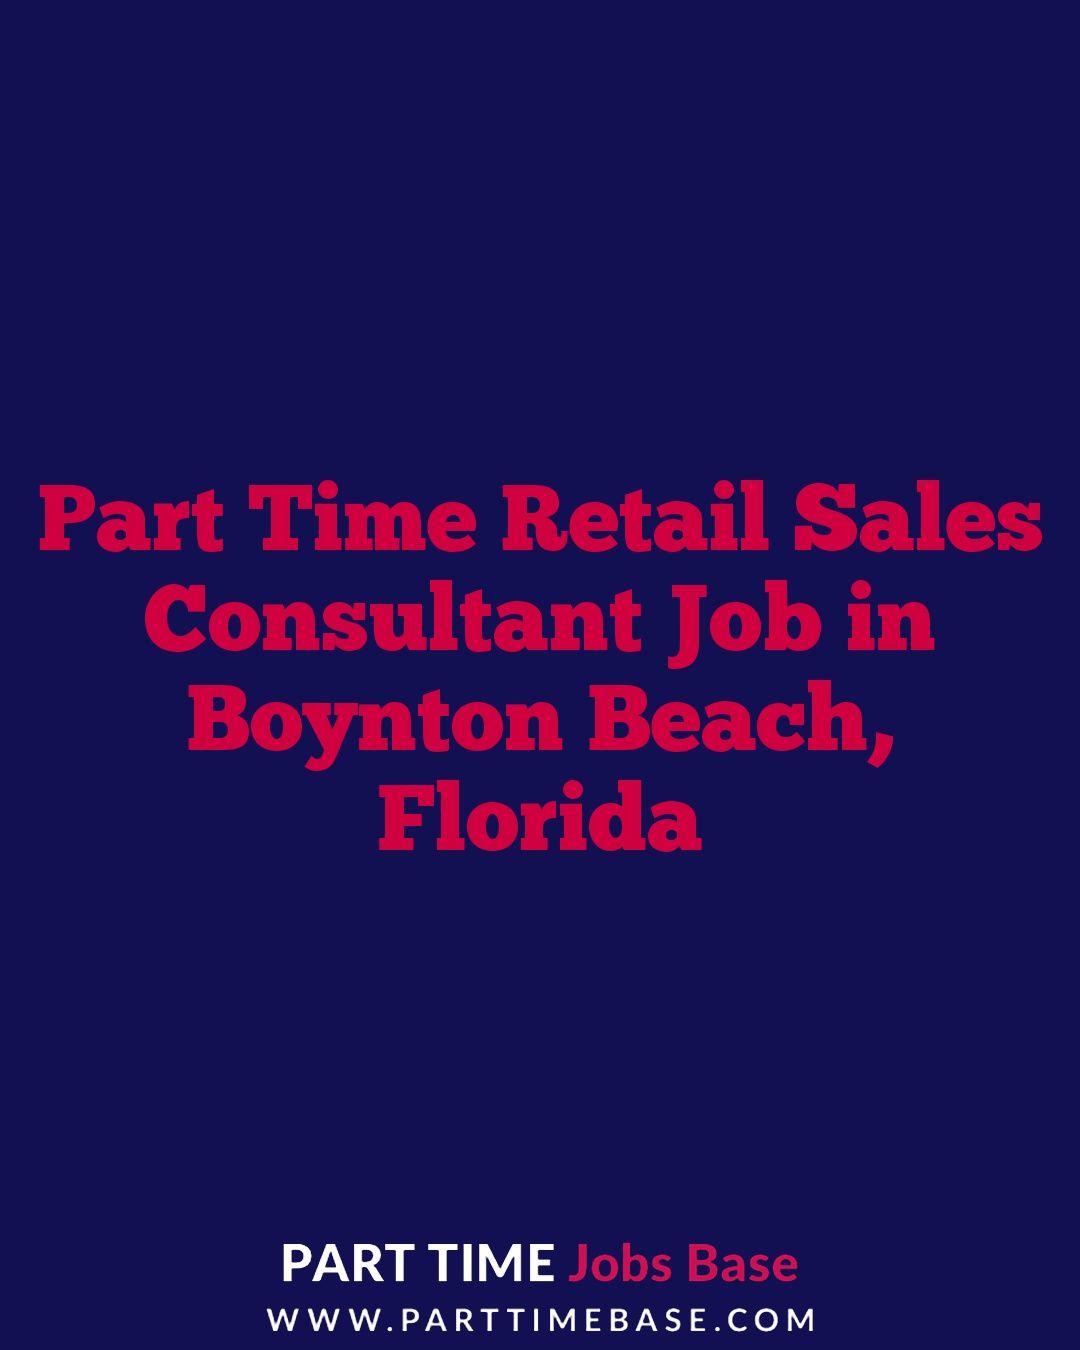 Part Time Retail Sales Consultant Job in Boynton Beach